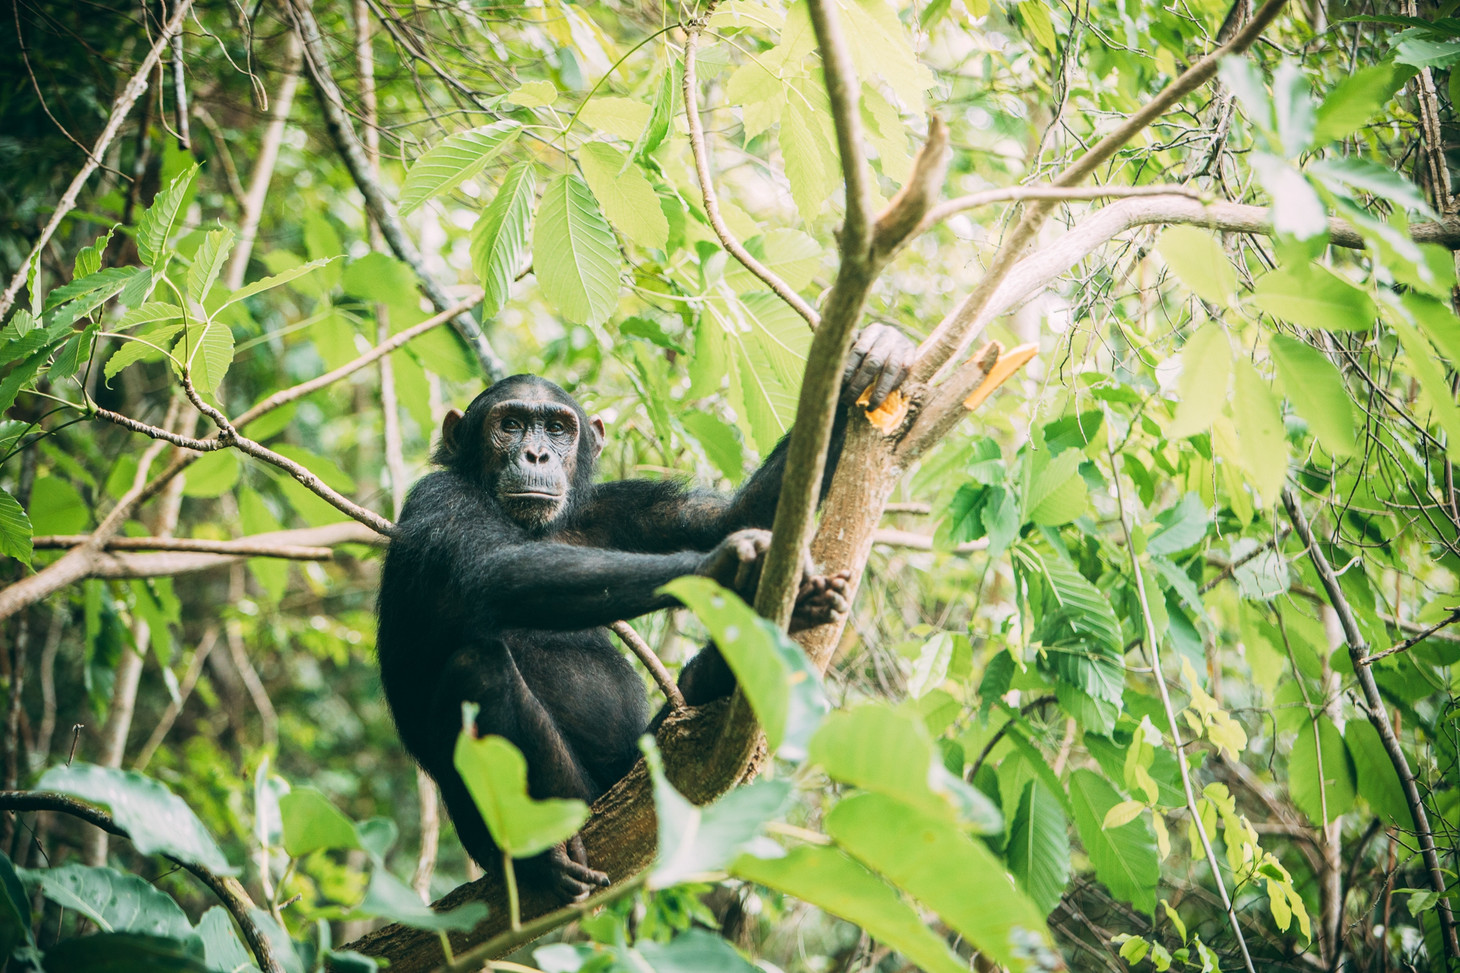 Pensive Chimpanzee at Greystokes, Mahale, Tanzania